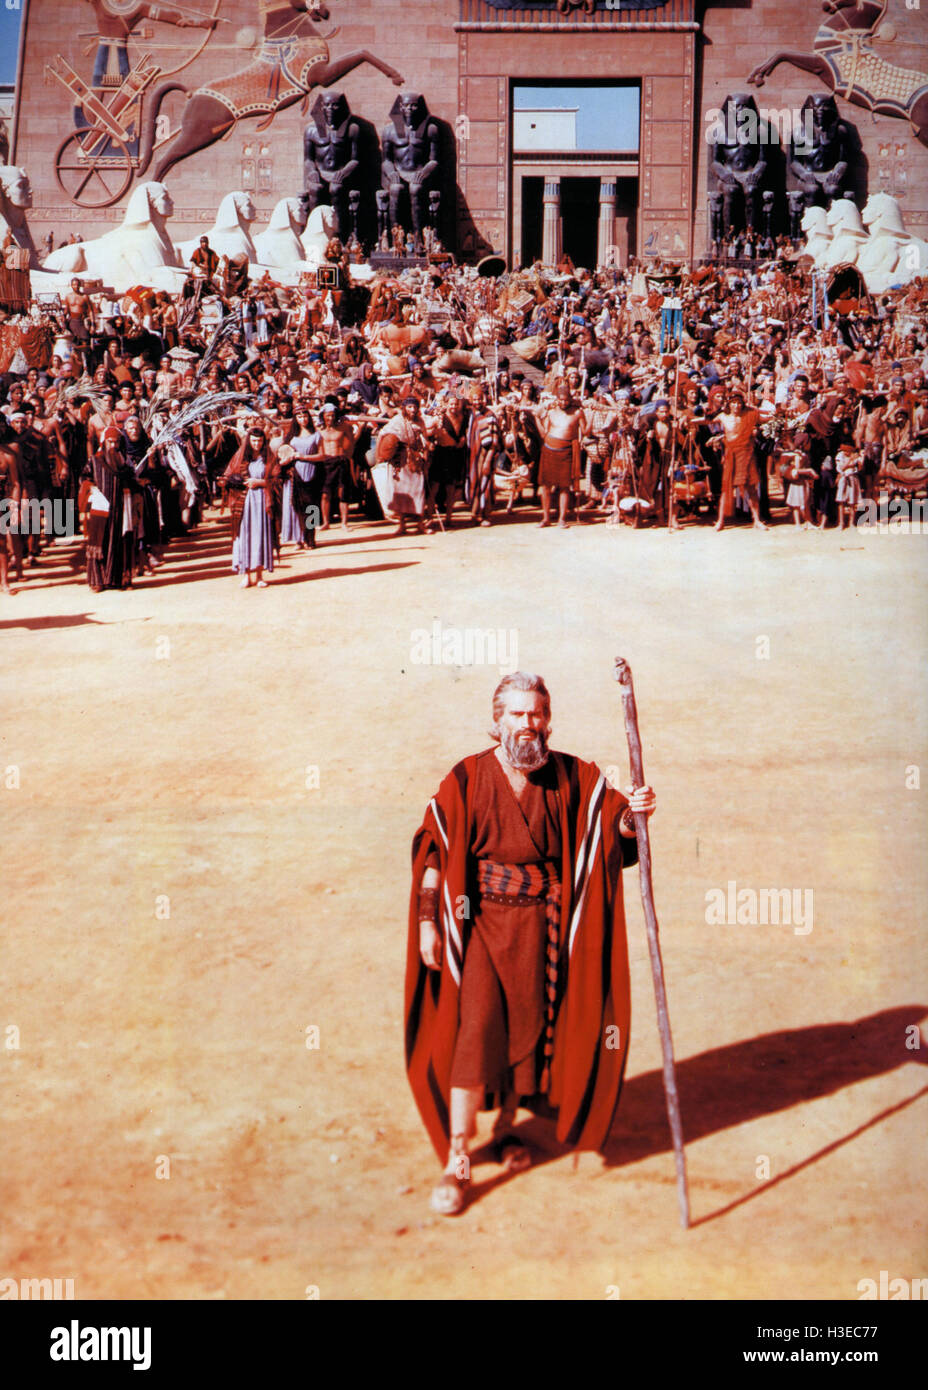 THE TEN COMMANDMENTS 1956 Paramount film with Charlton Heston as Moses - Stock Image